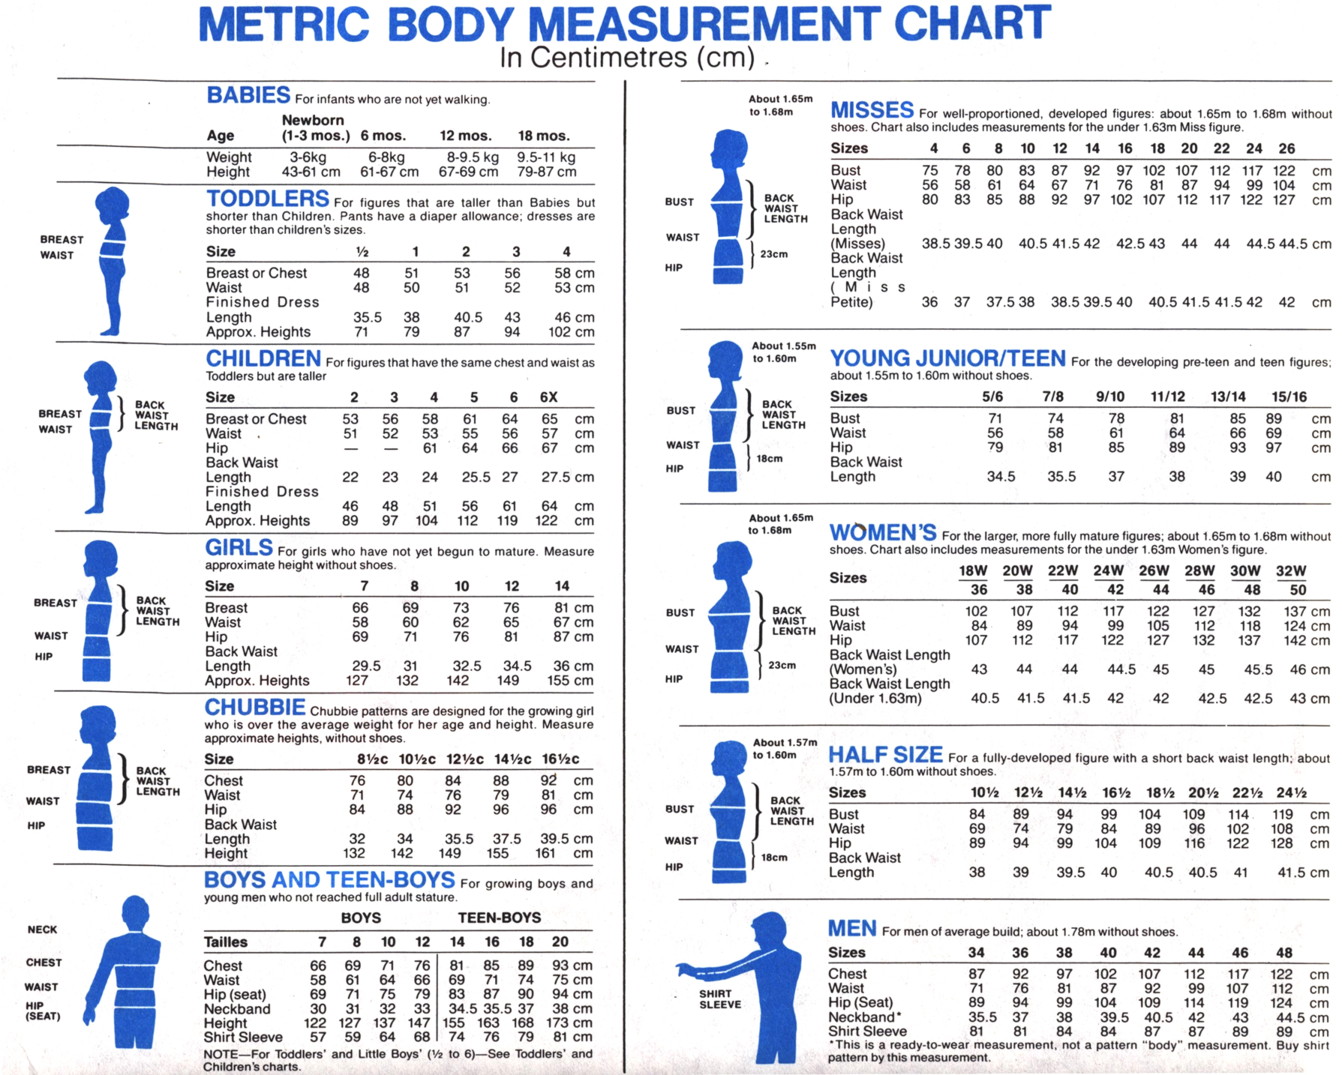 Body Measurements Chart | www.galleryhip.com - The Hippest Pics